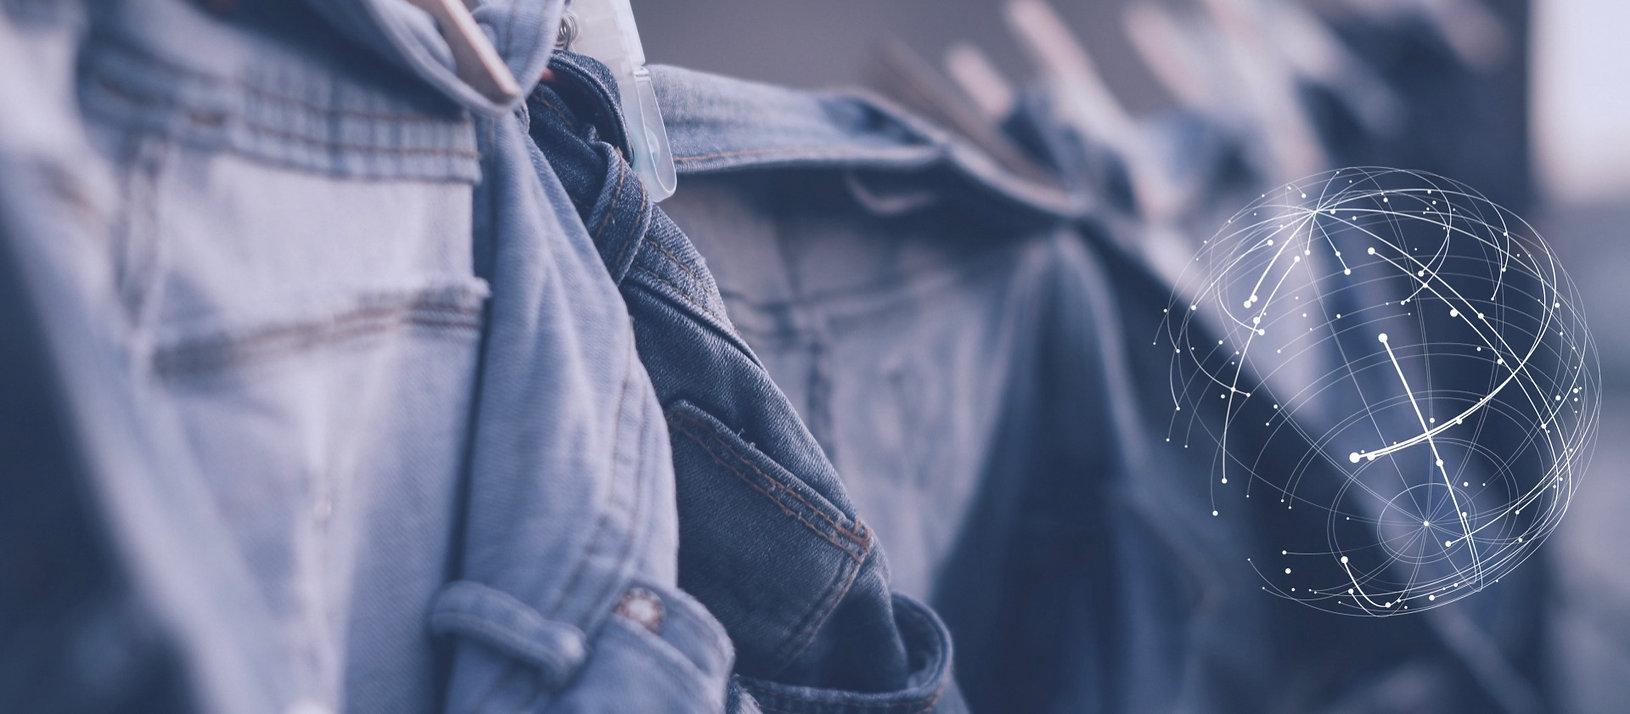 Eon Partner Network powers data-exchange to close circular economy gap across fashion retail